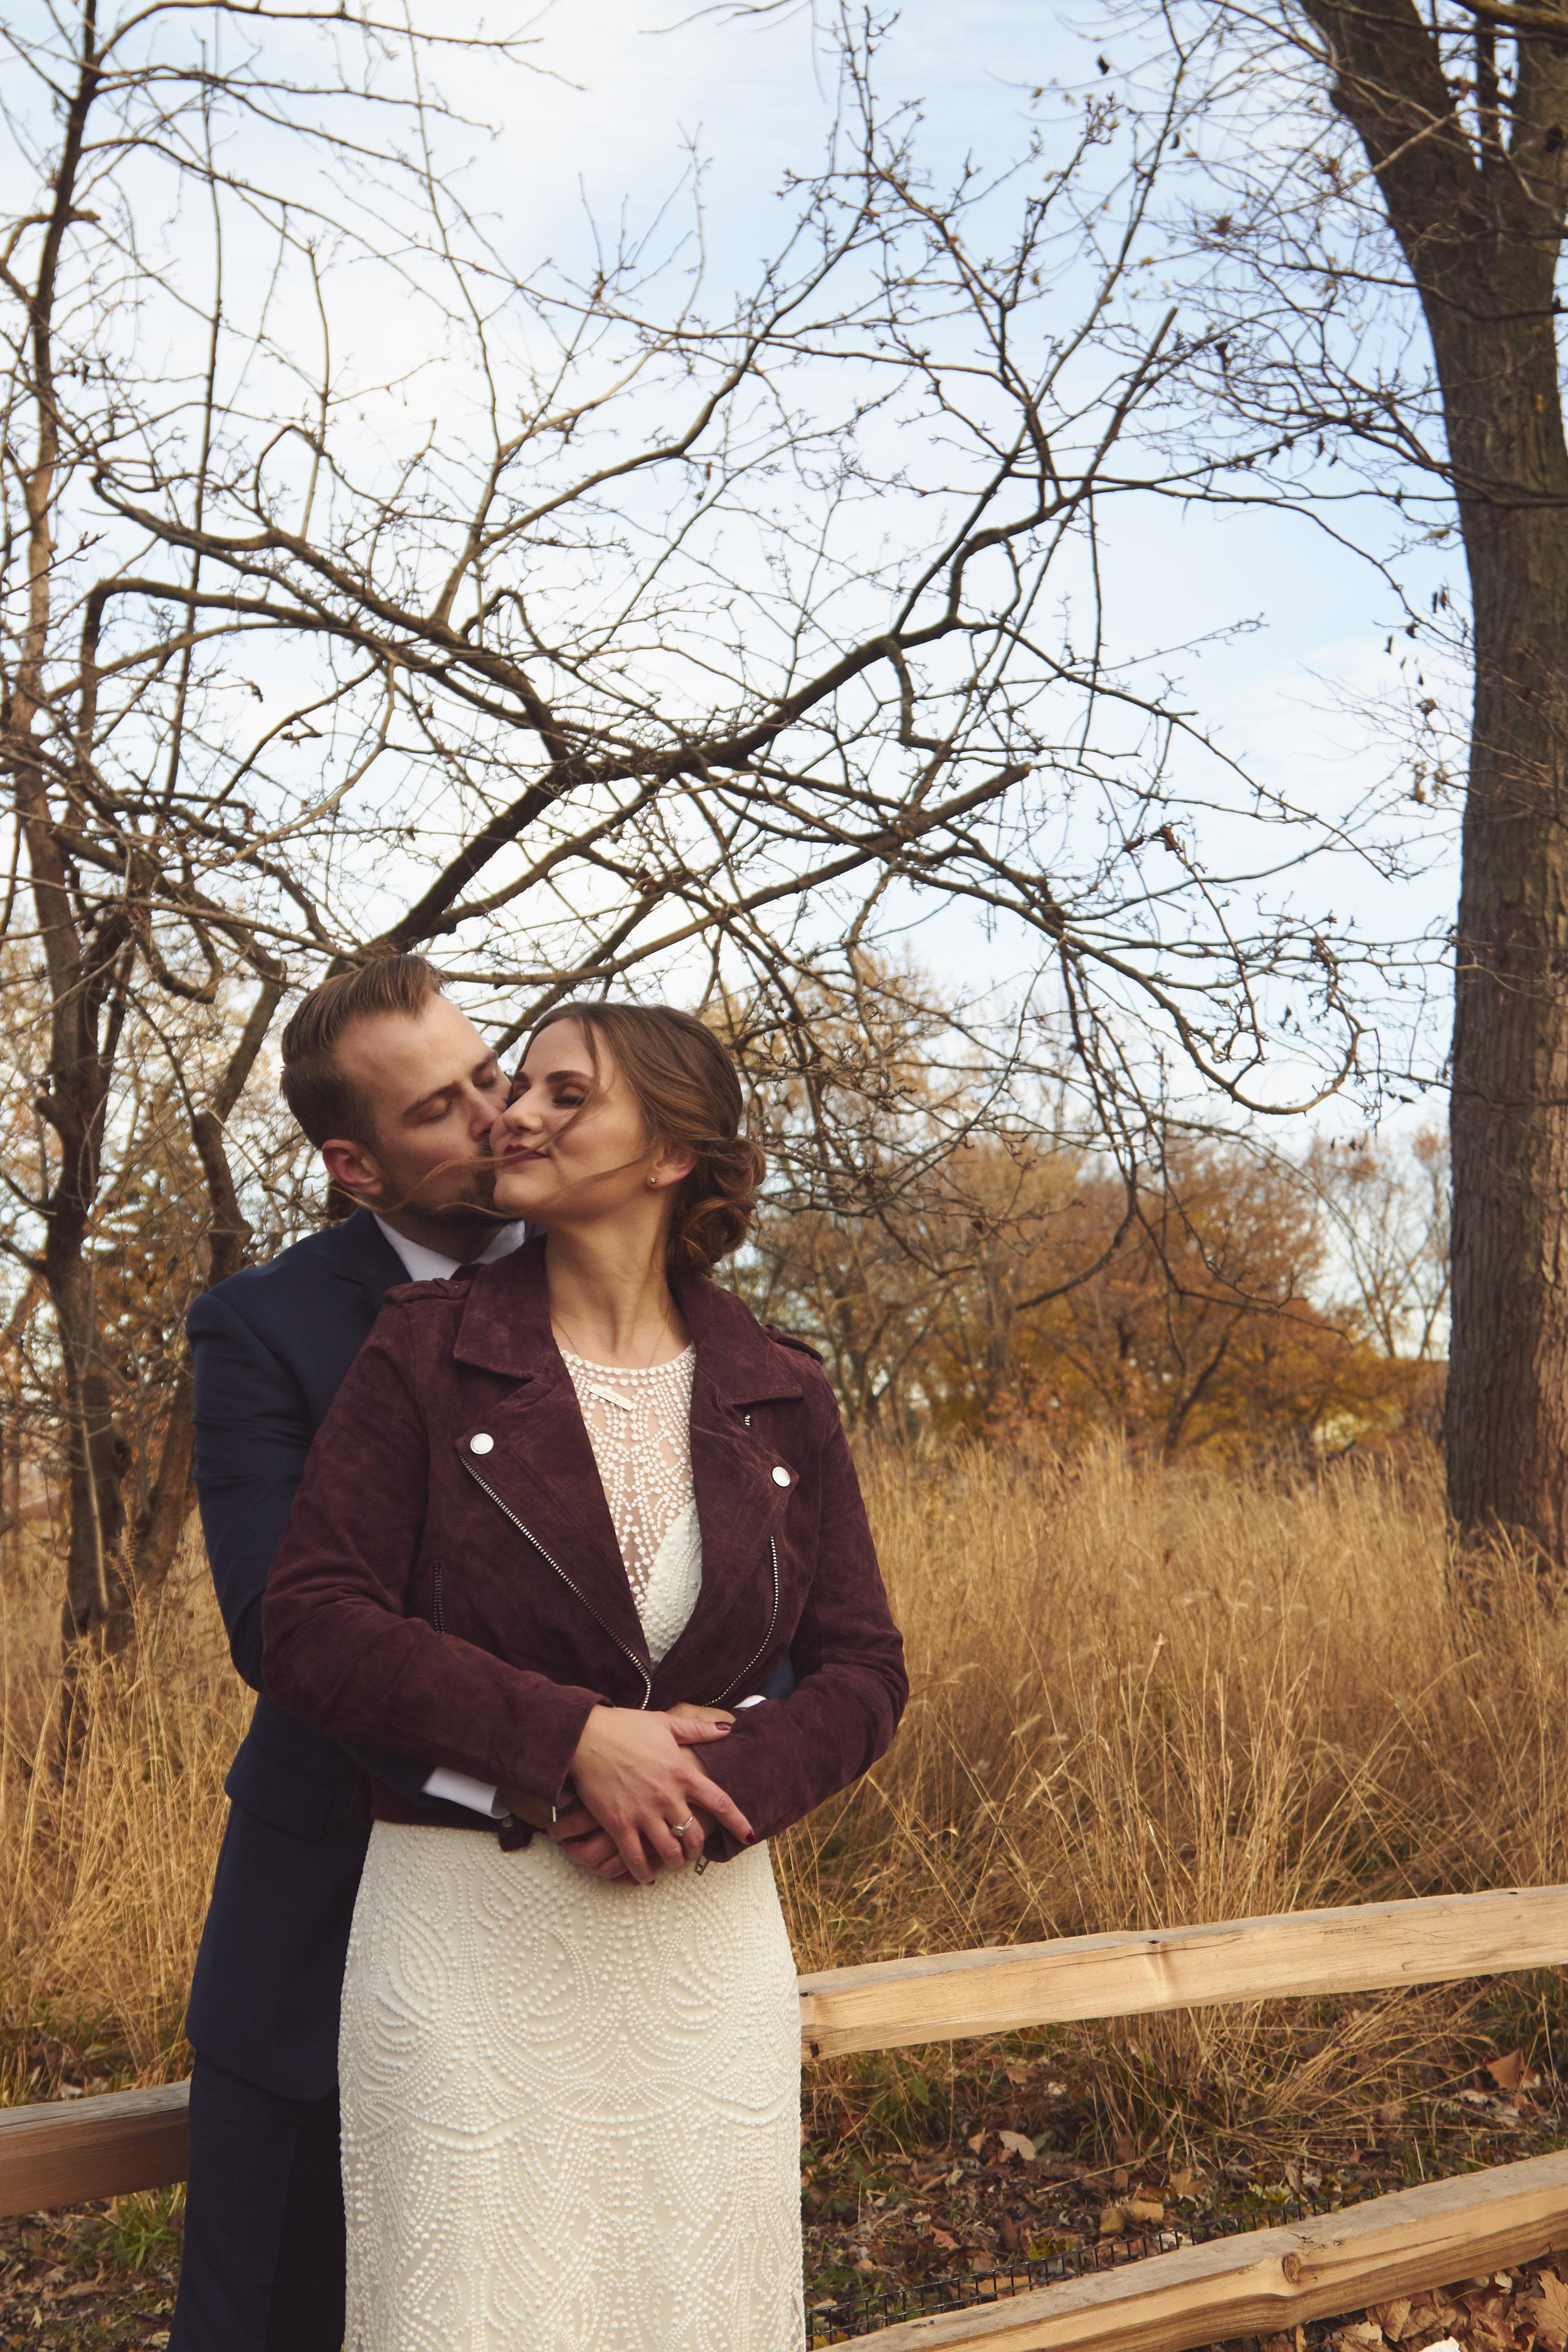 Jen & Ben  - Devin - benromangphoto - IMG_0622.jpg